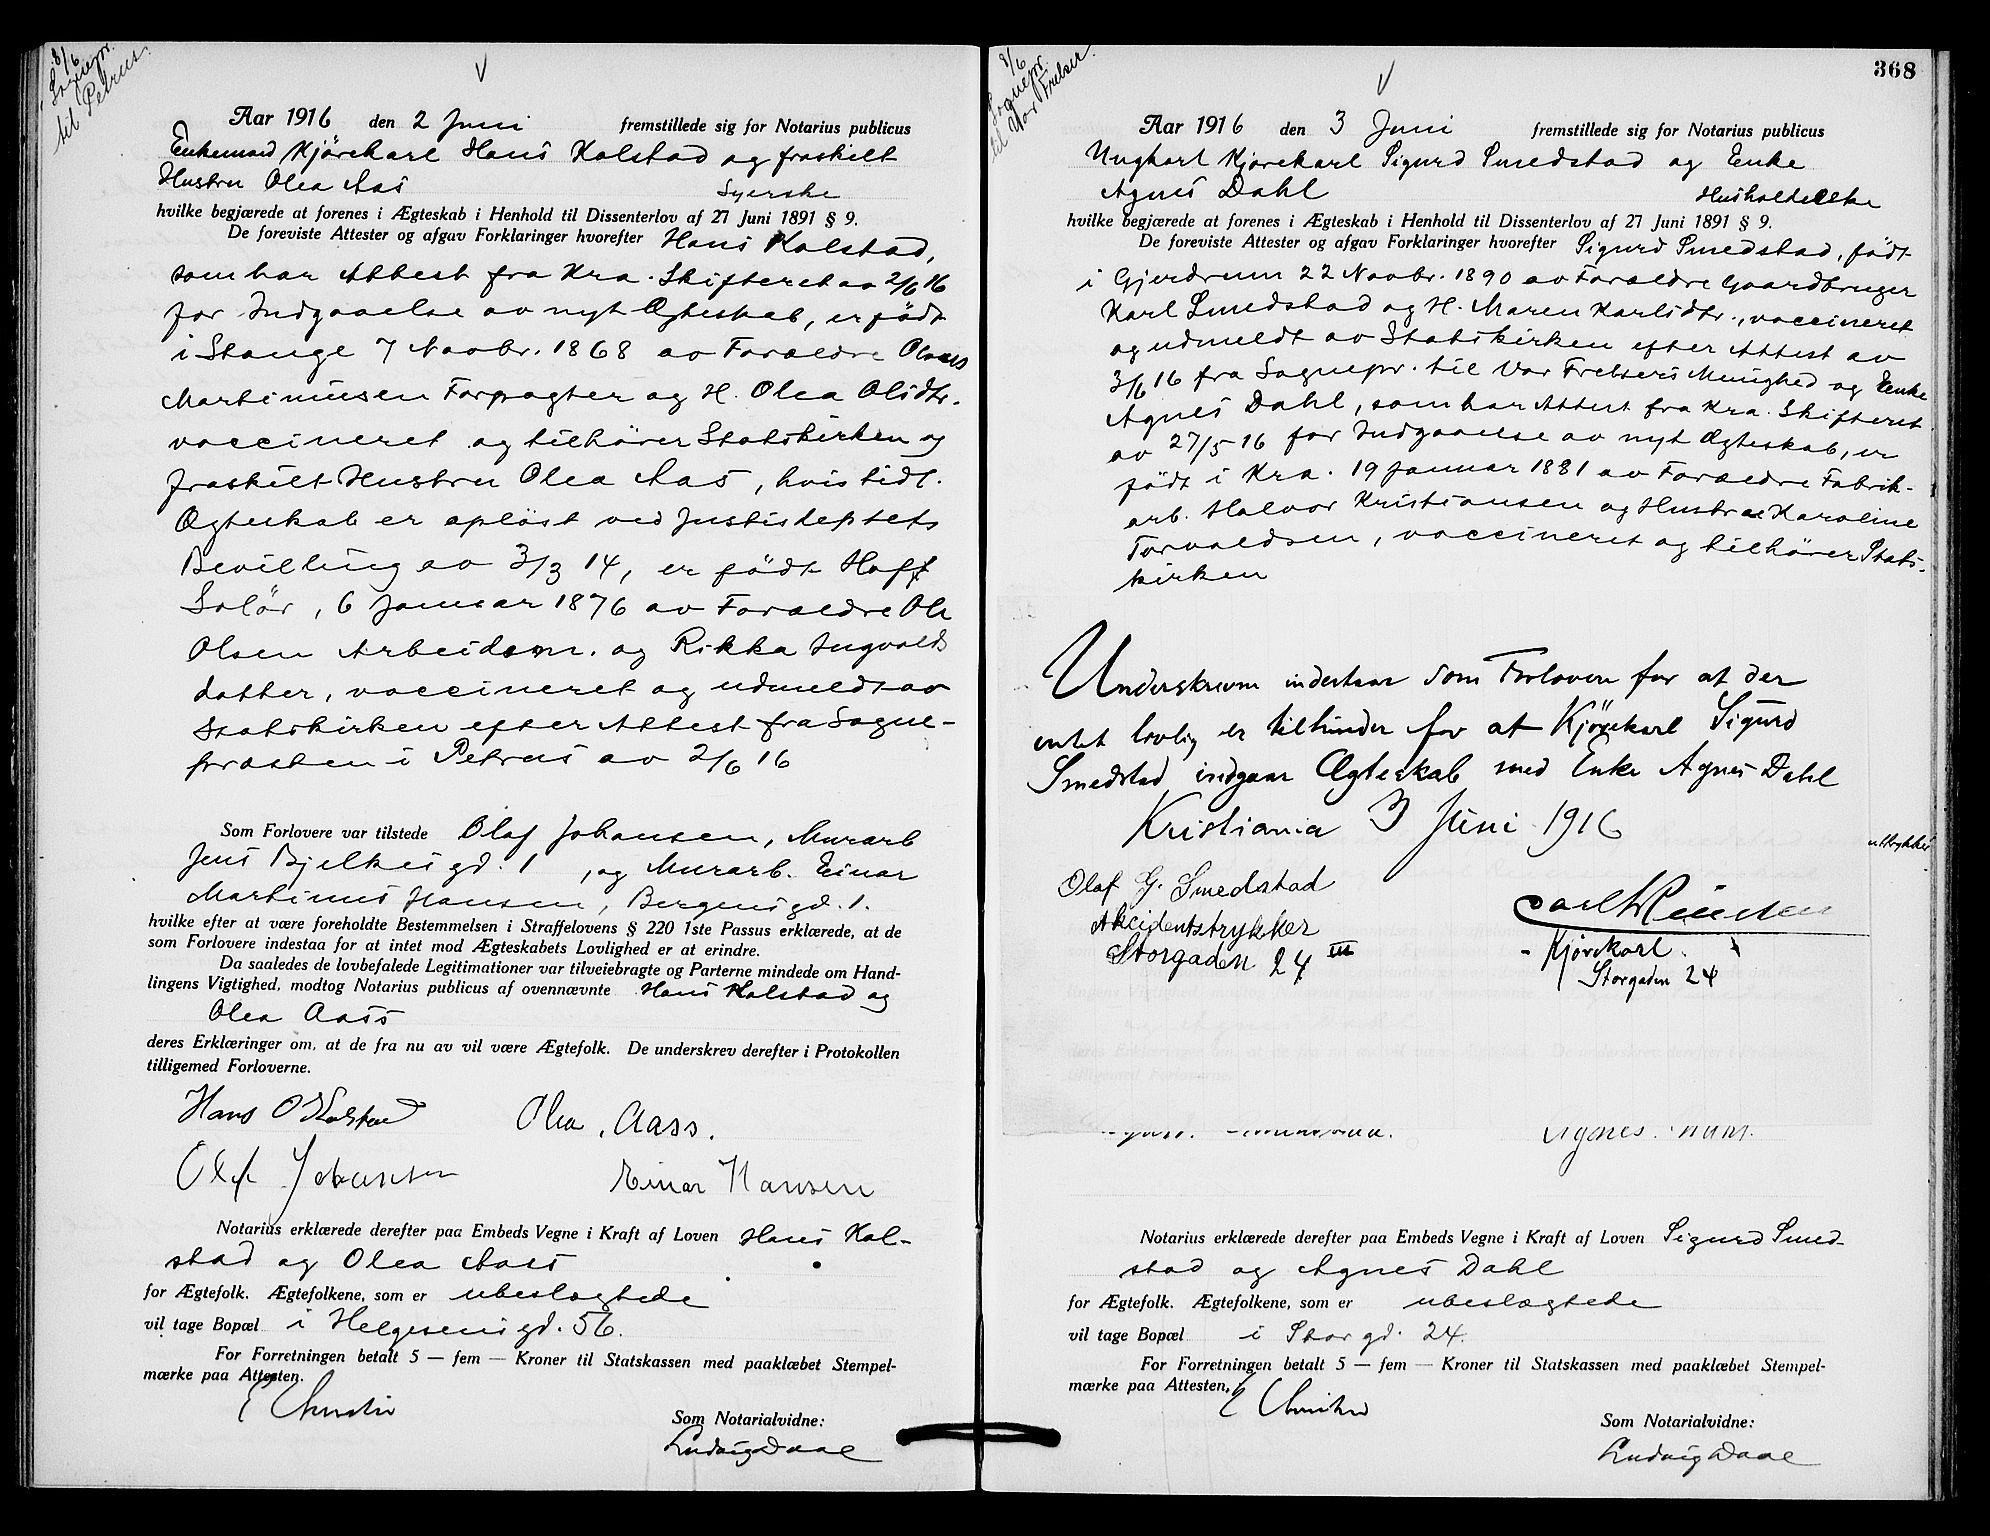 SAO, Oslo byfogd avd. I, L/Lb/Lbb/L0010: Notarialprotokoll, rekke II: Vigsler, 1914-1916, s. 467b-468a